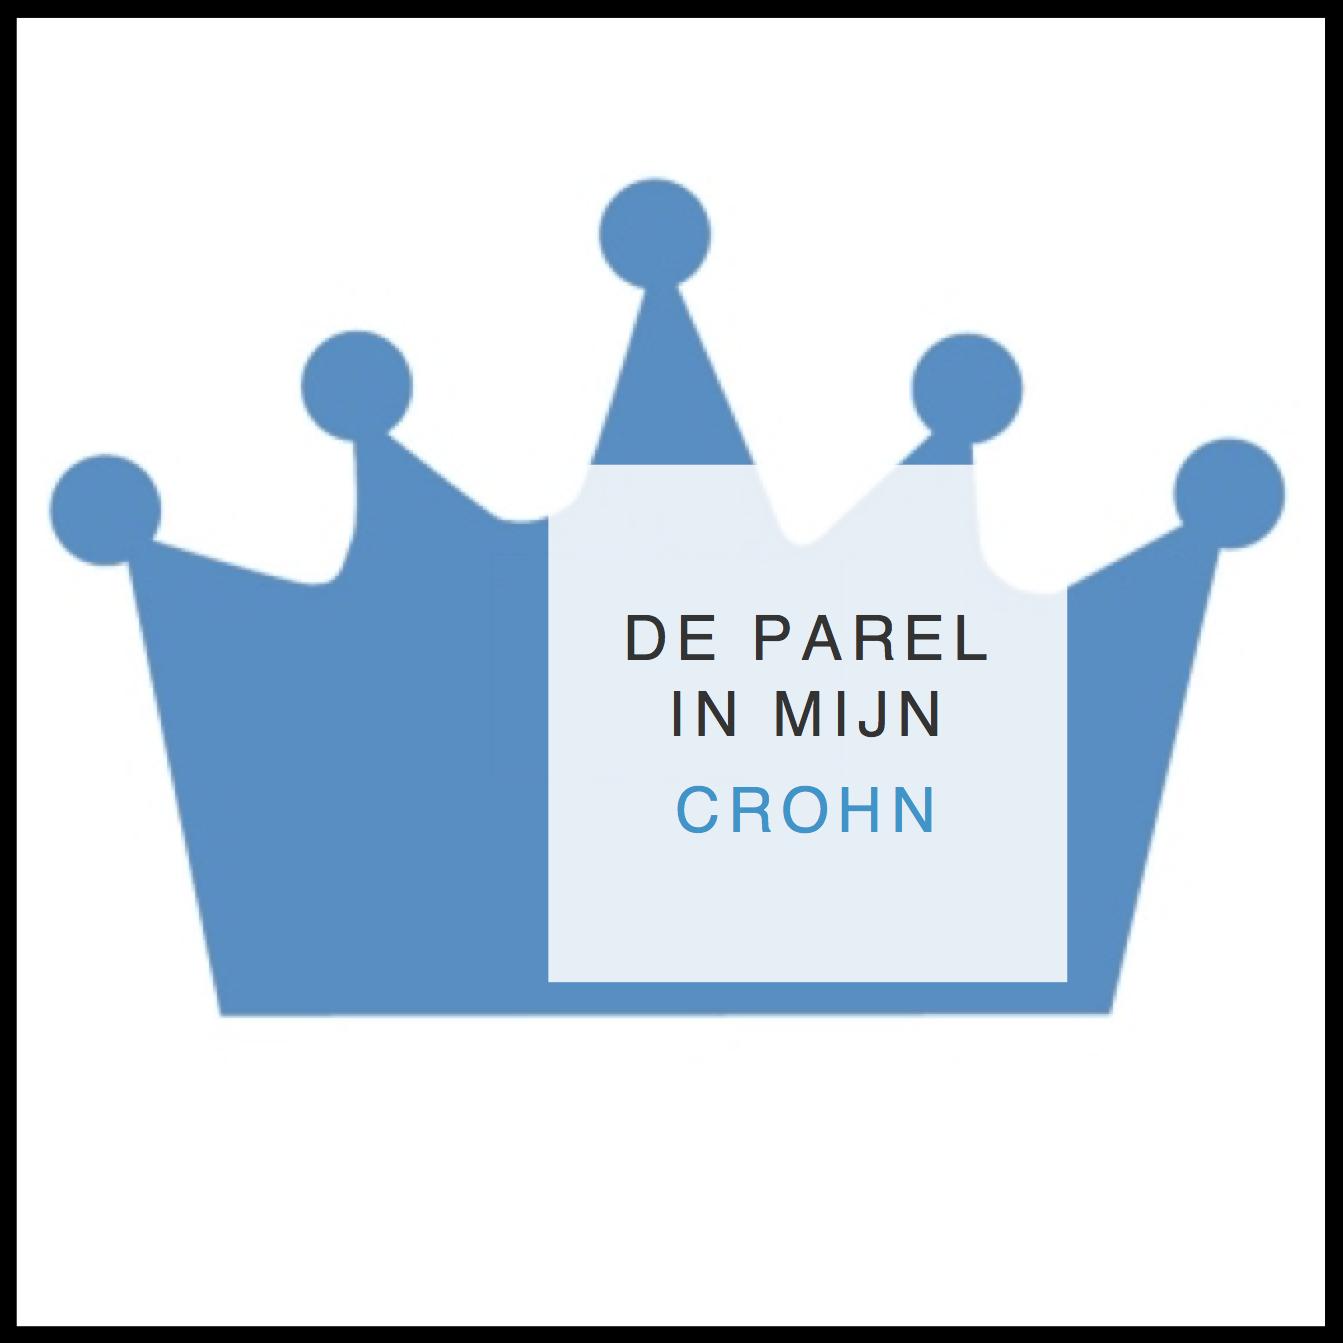 de parel in mijn Crohn - CreativeHealth.nl